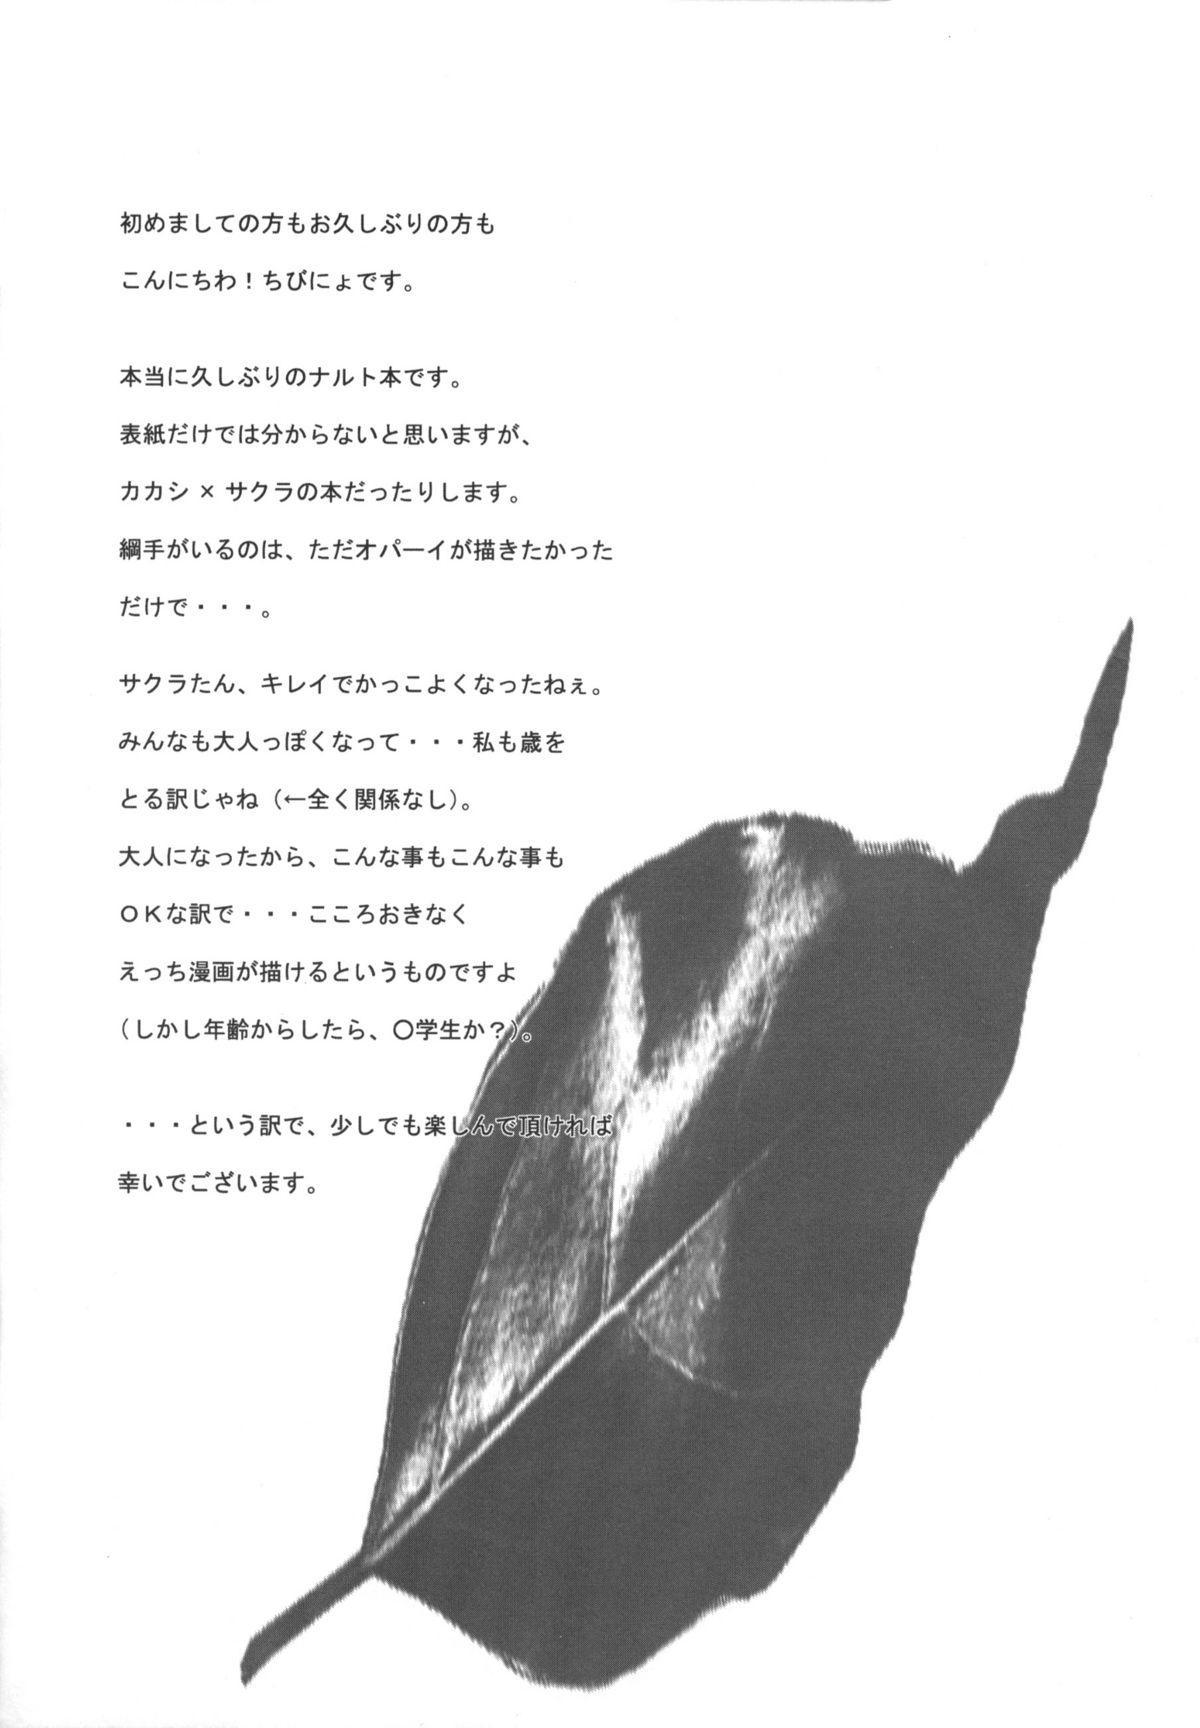 (C70) [HAMUSTAR (Chibinyo)] Hamu-juu -San- (Naruto) 2